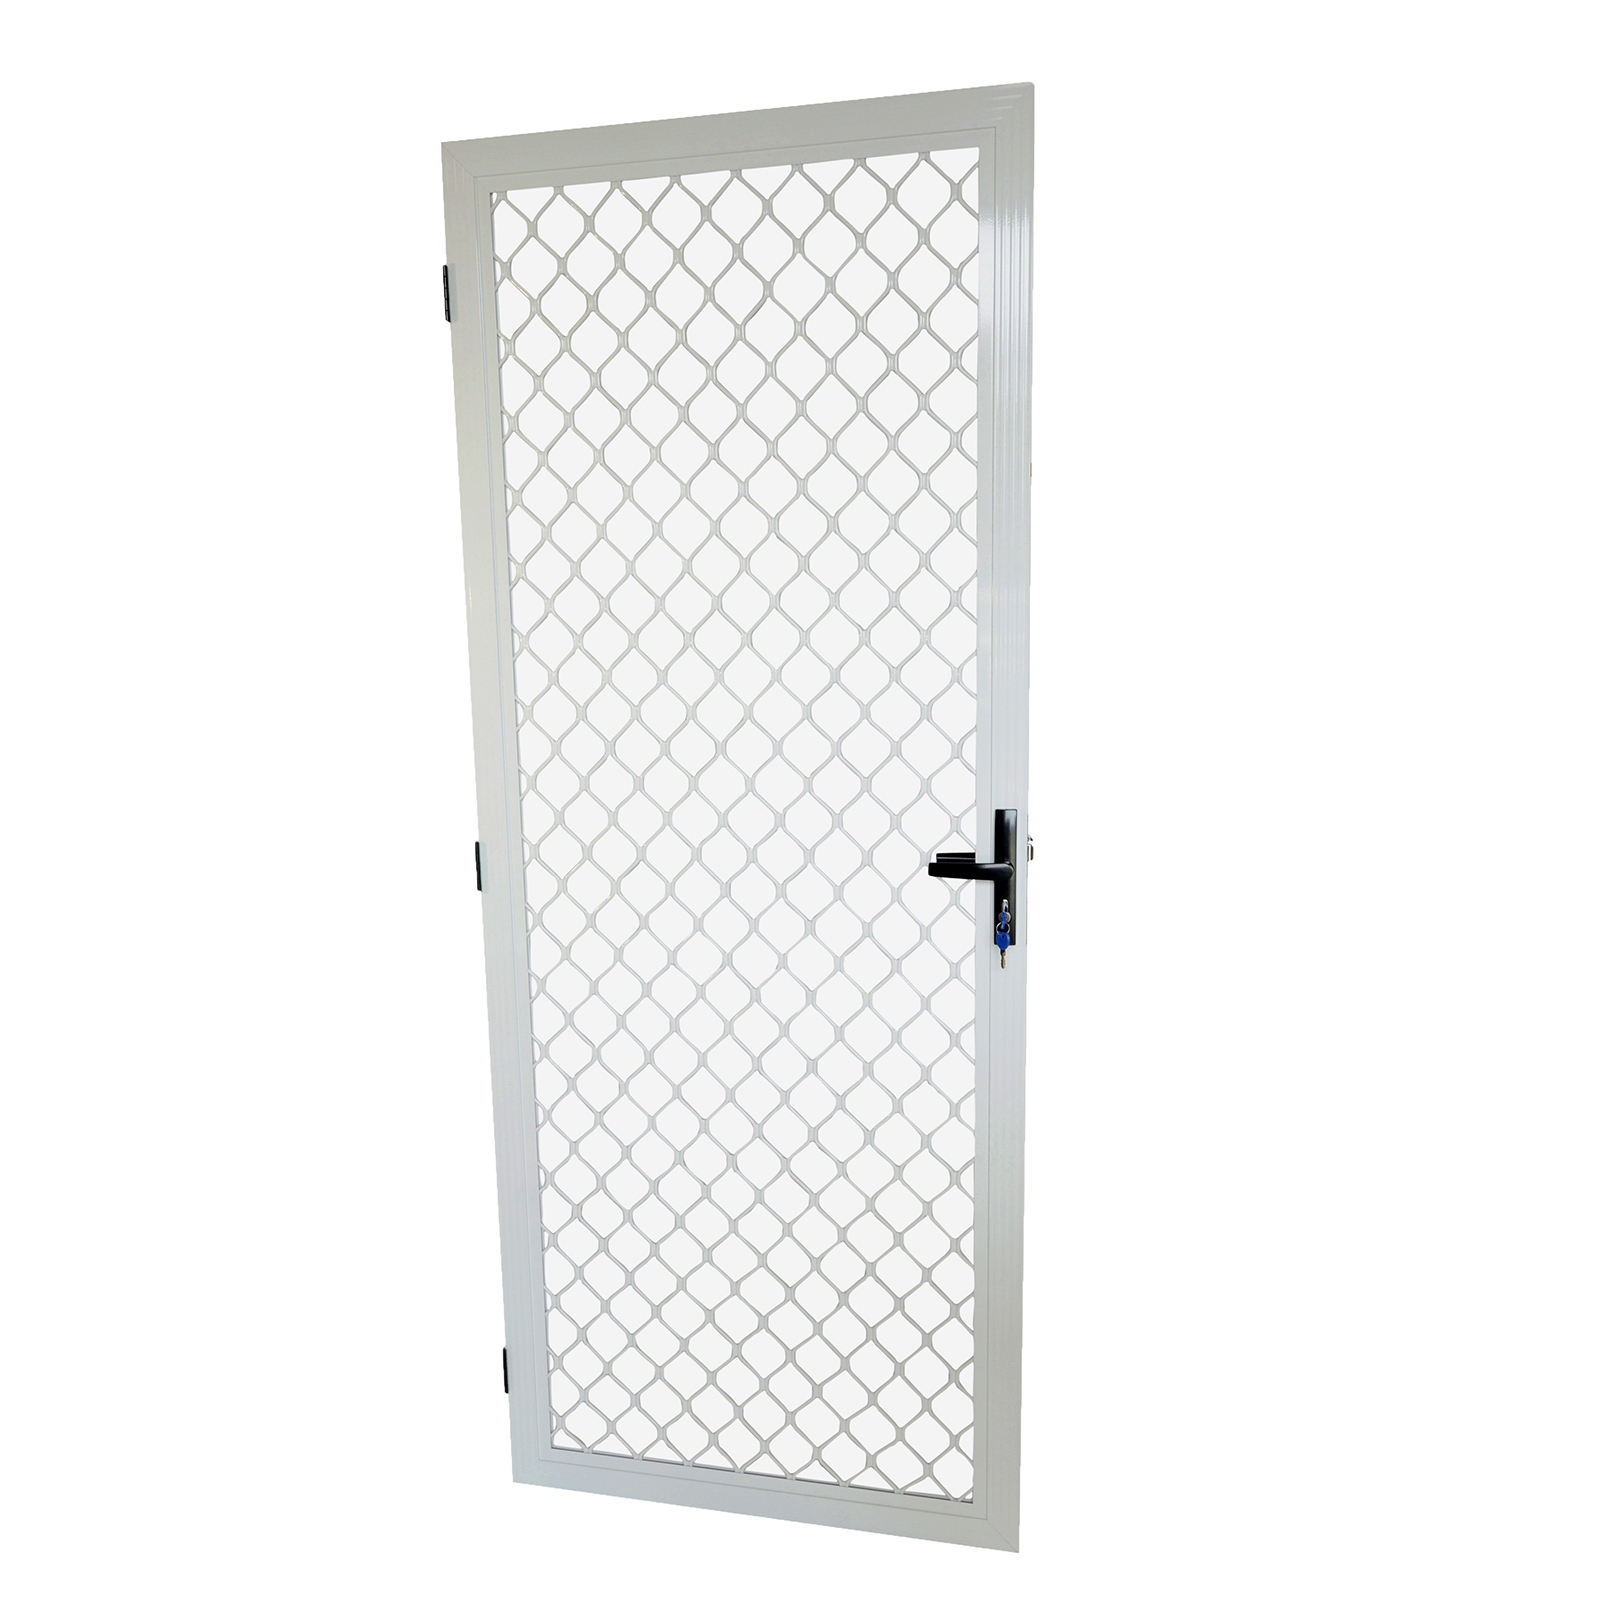 Protector Aluminium 813 x 2032mm White Metric Fixed Barrier Door